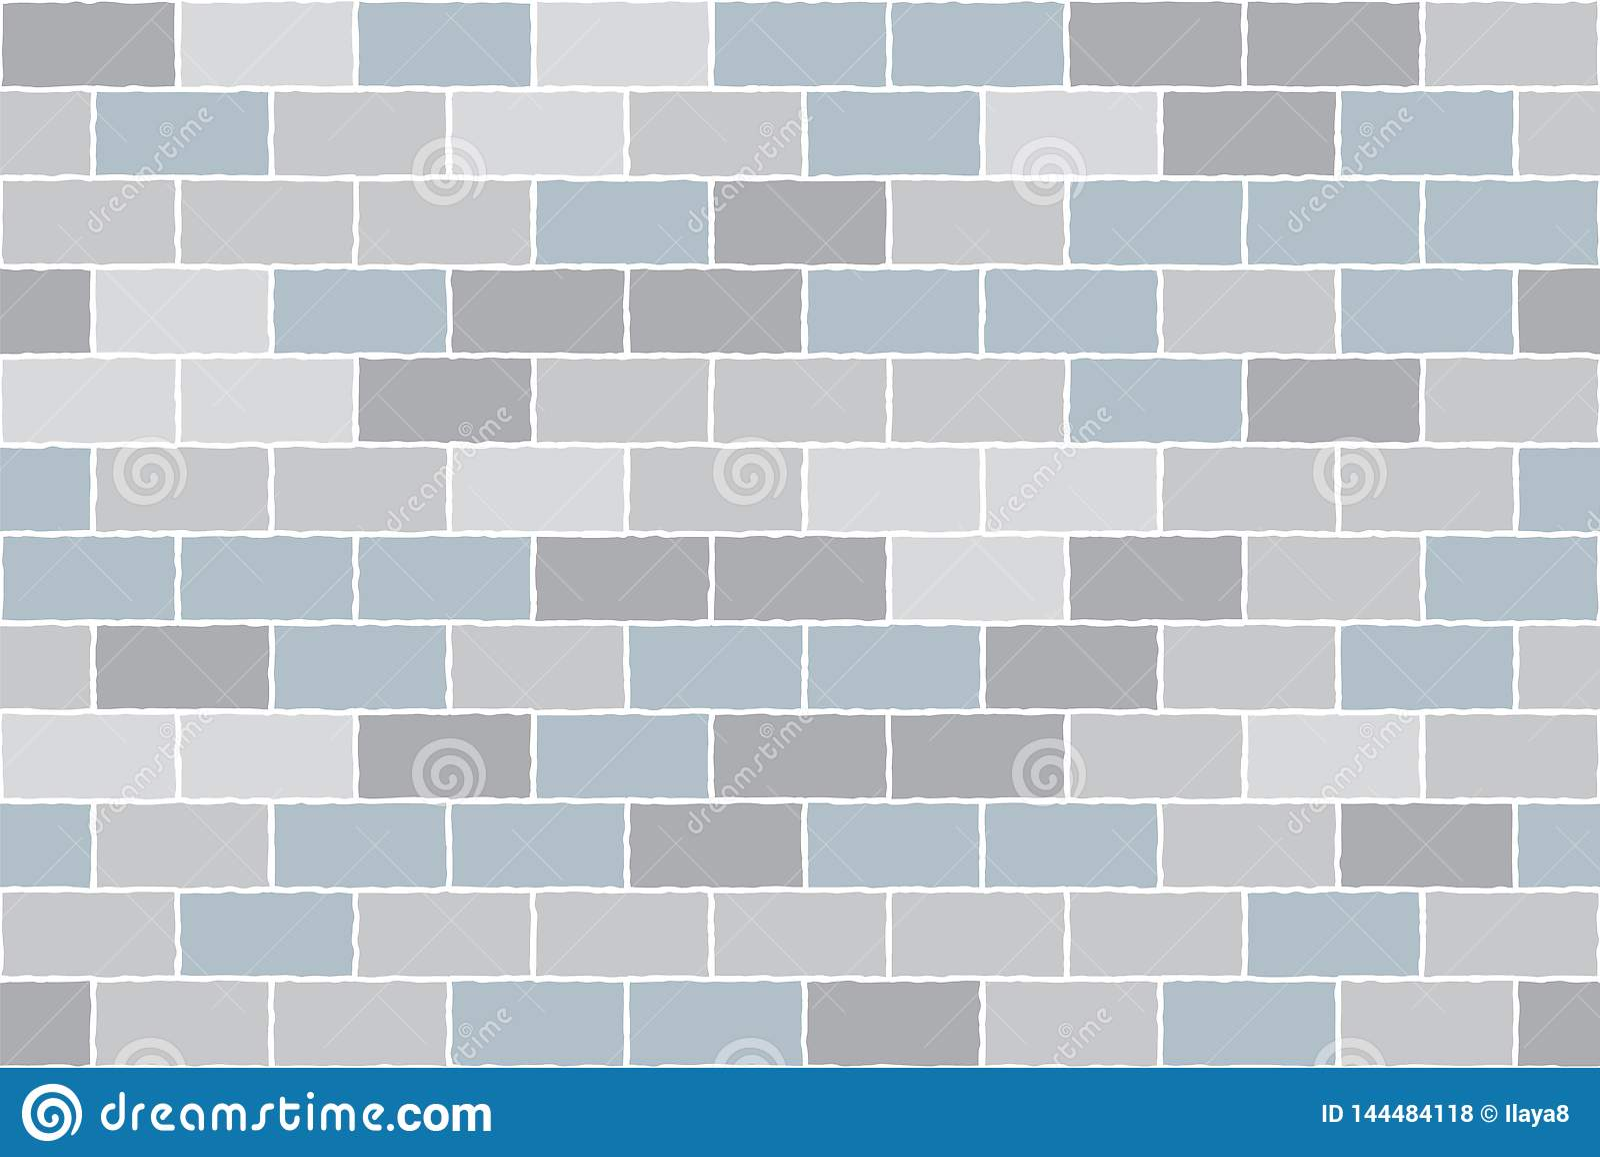 Grey brick wall. Vector background. Seamless pattern